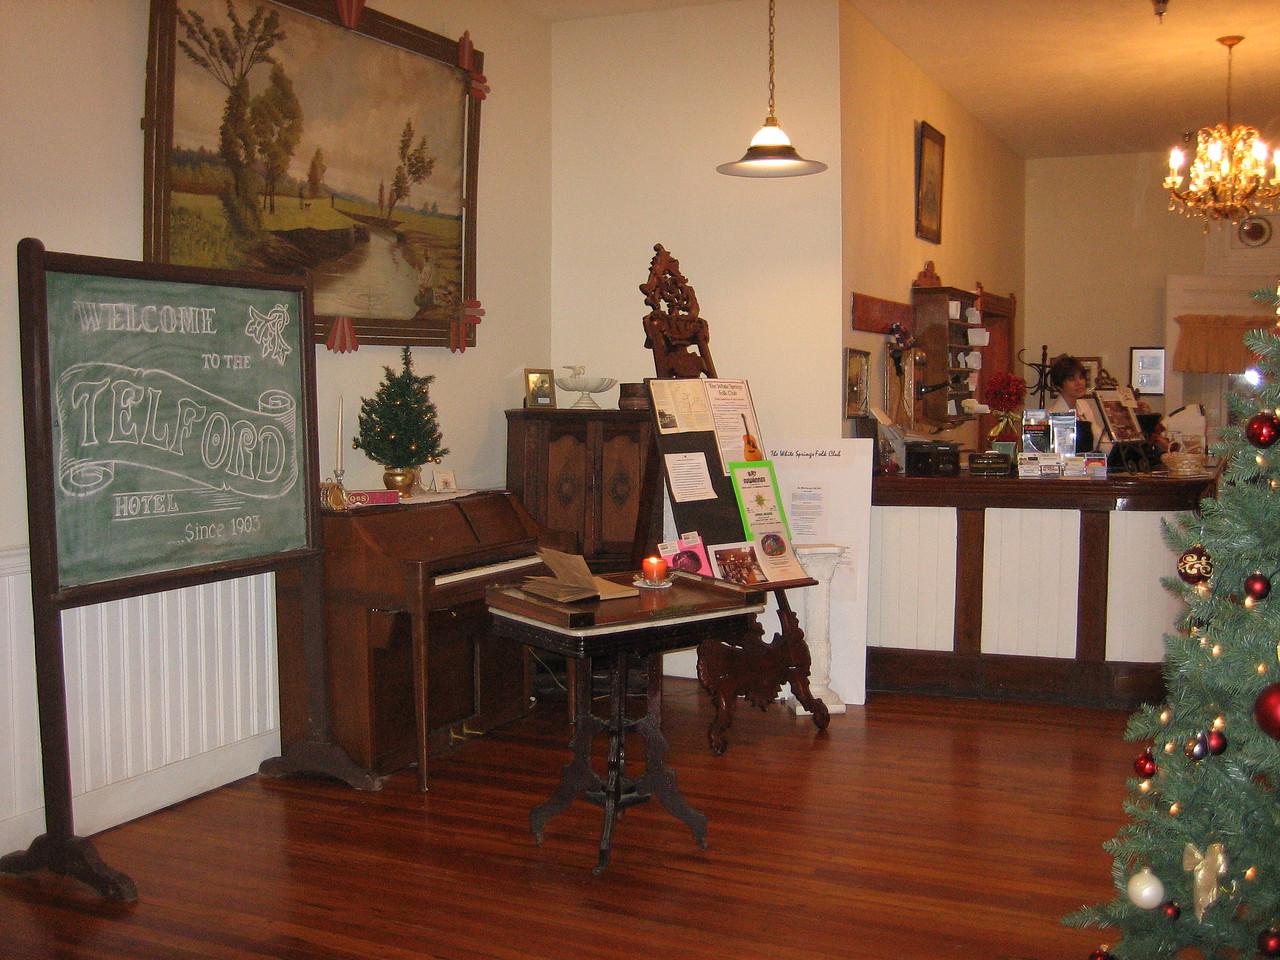 Historic Telford Hotel at Christmastime<br /> PHOTO CREDIT: Sandra Friend / Florida Trail Association